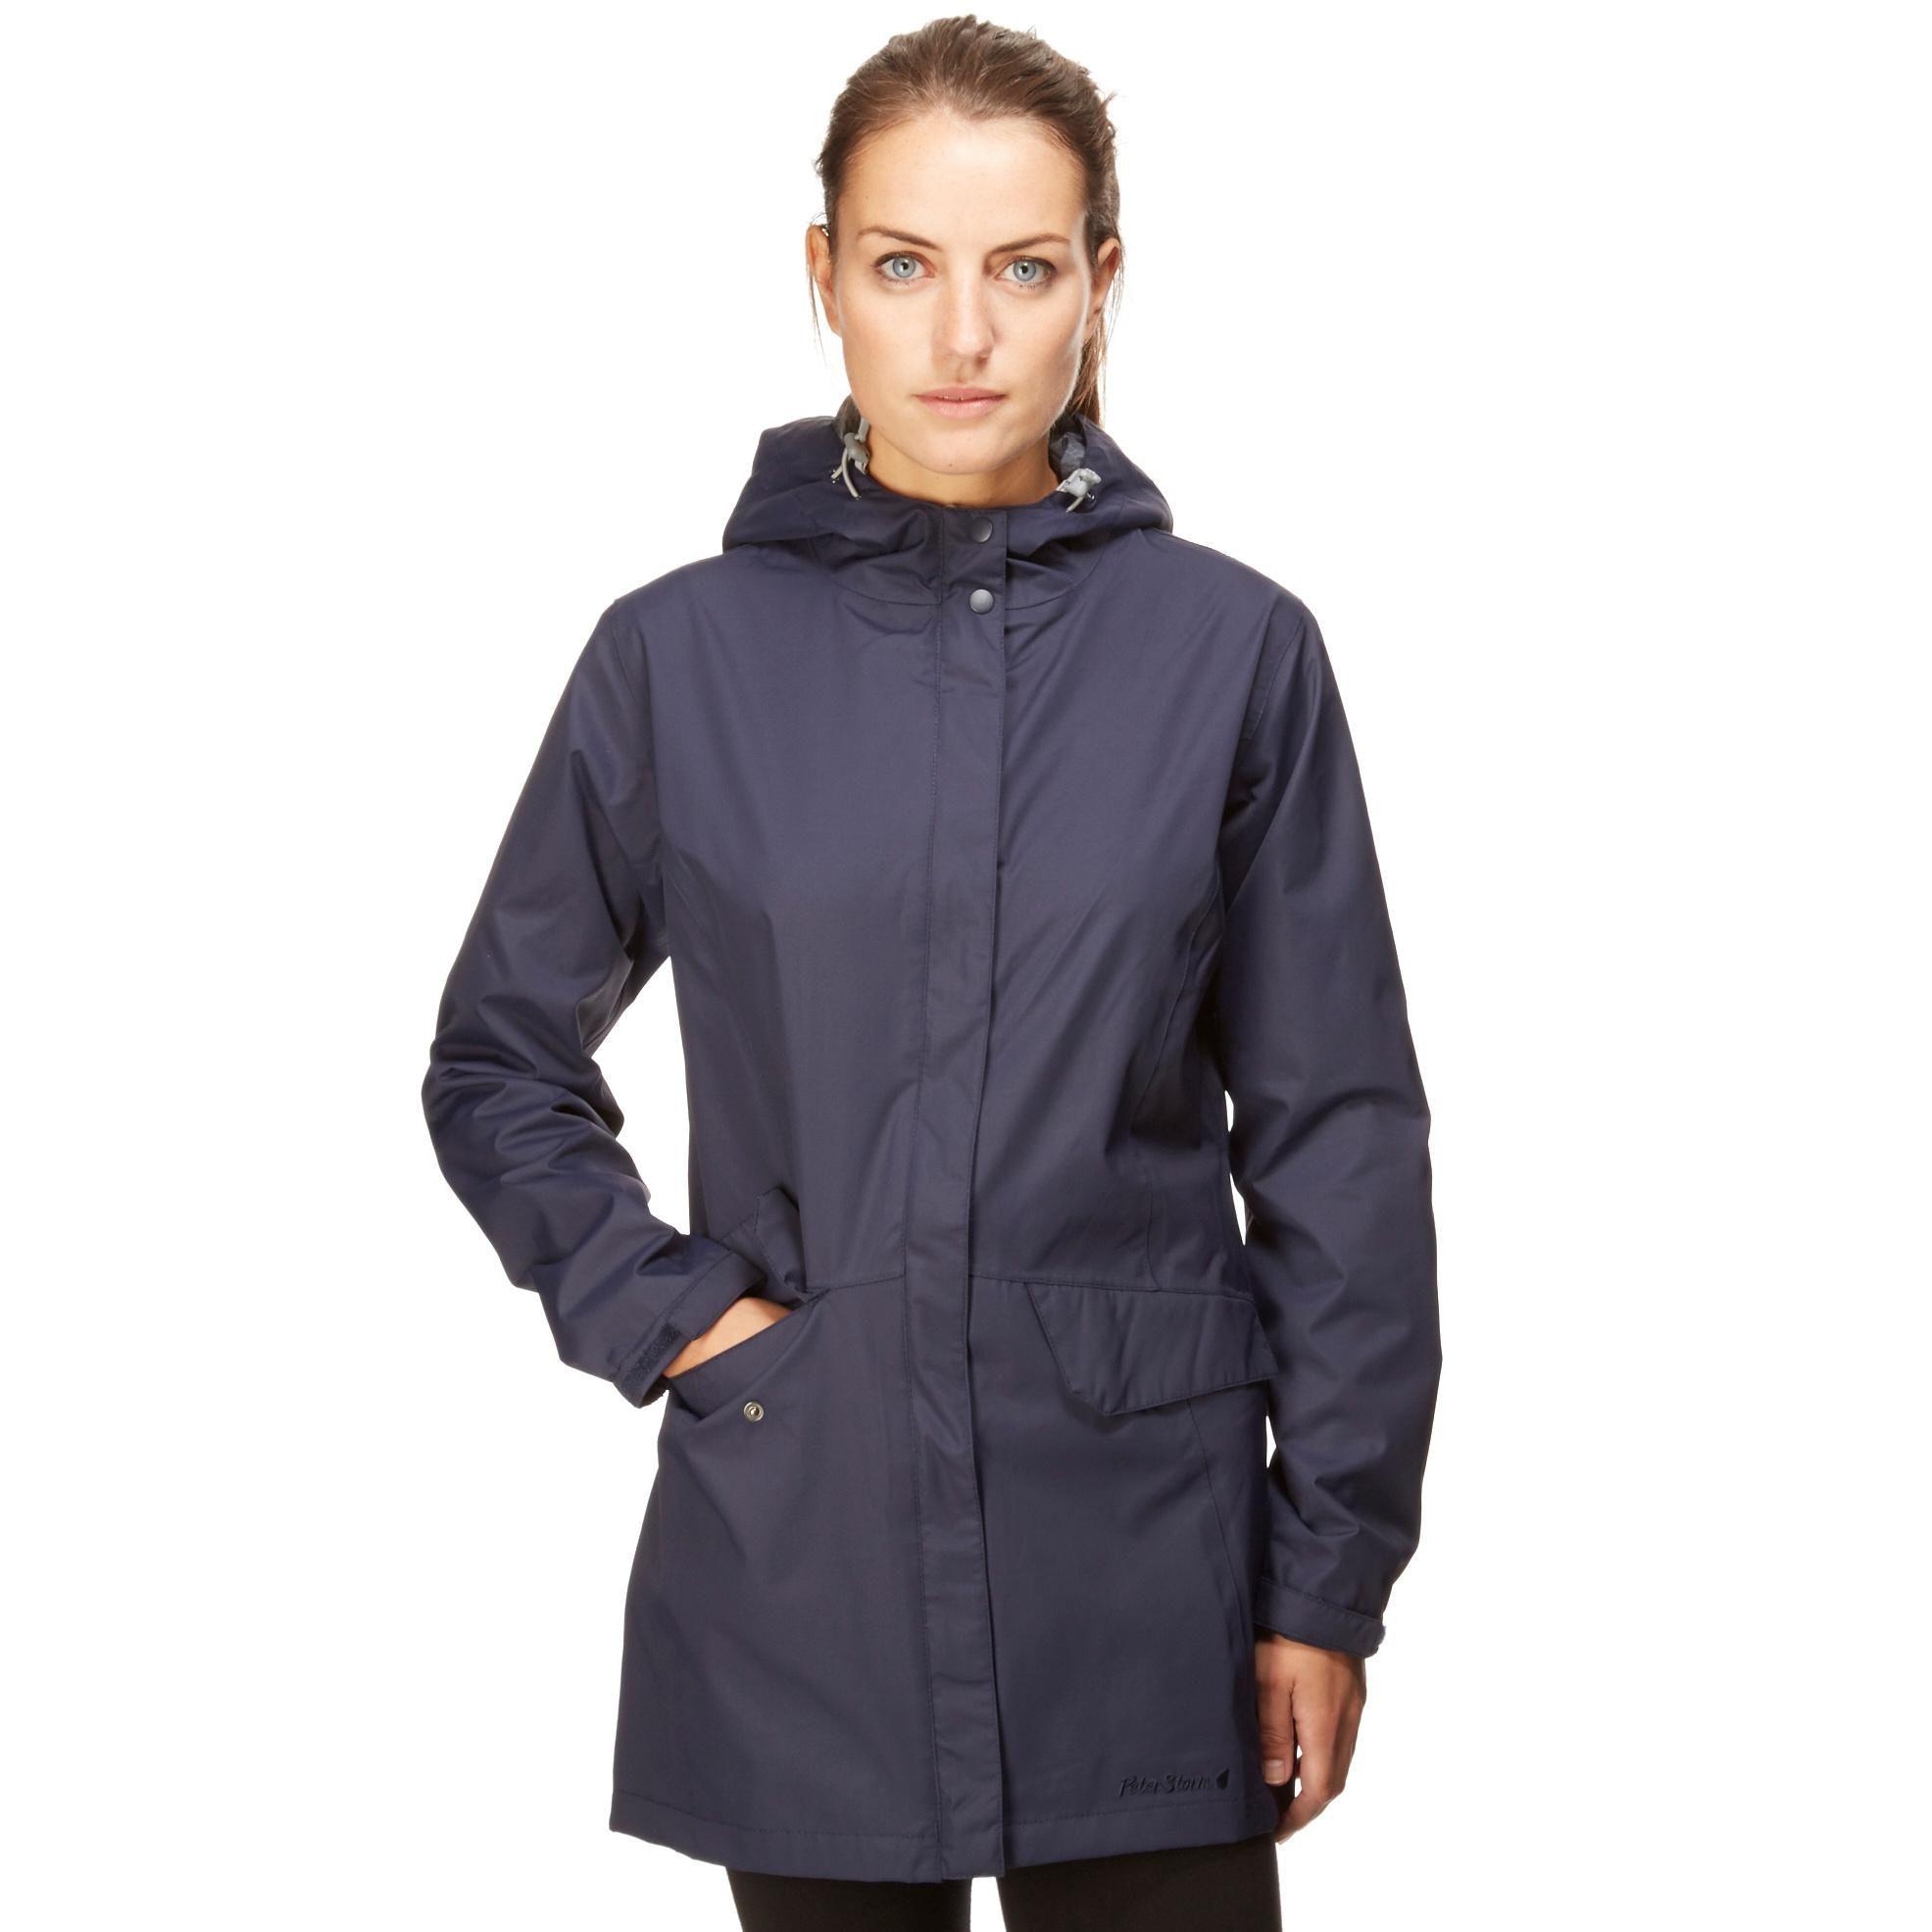 Womens Navy Waterproof Jacket - JacketIn